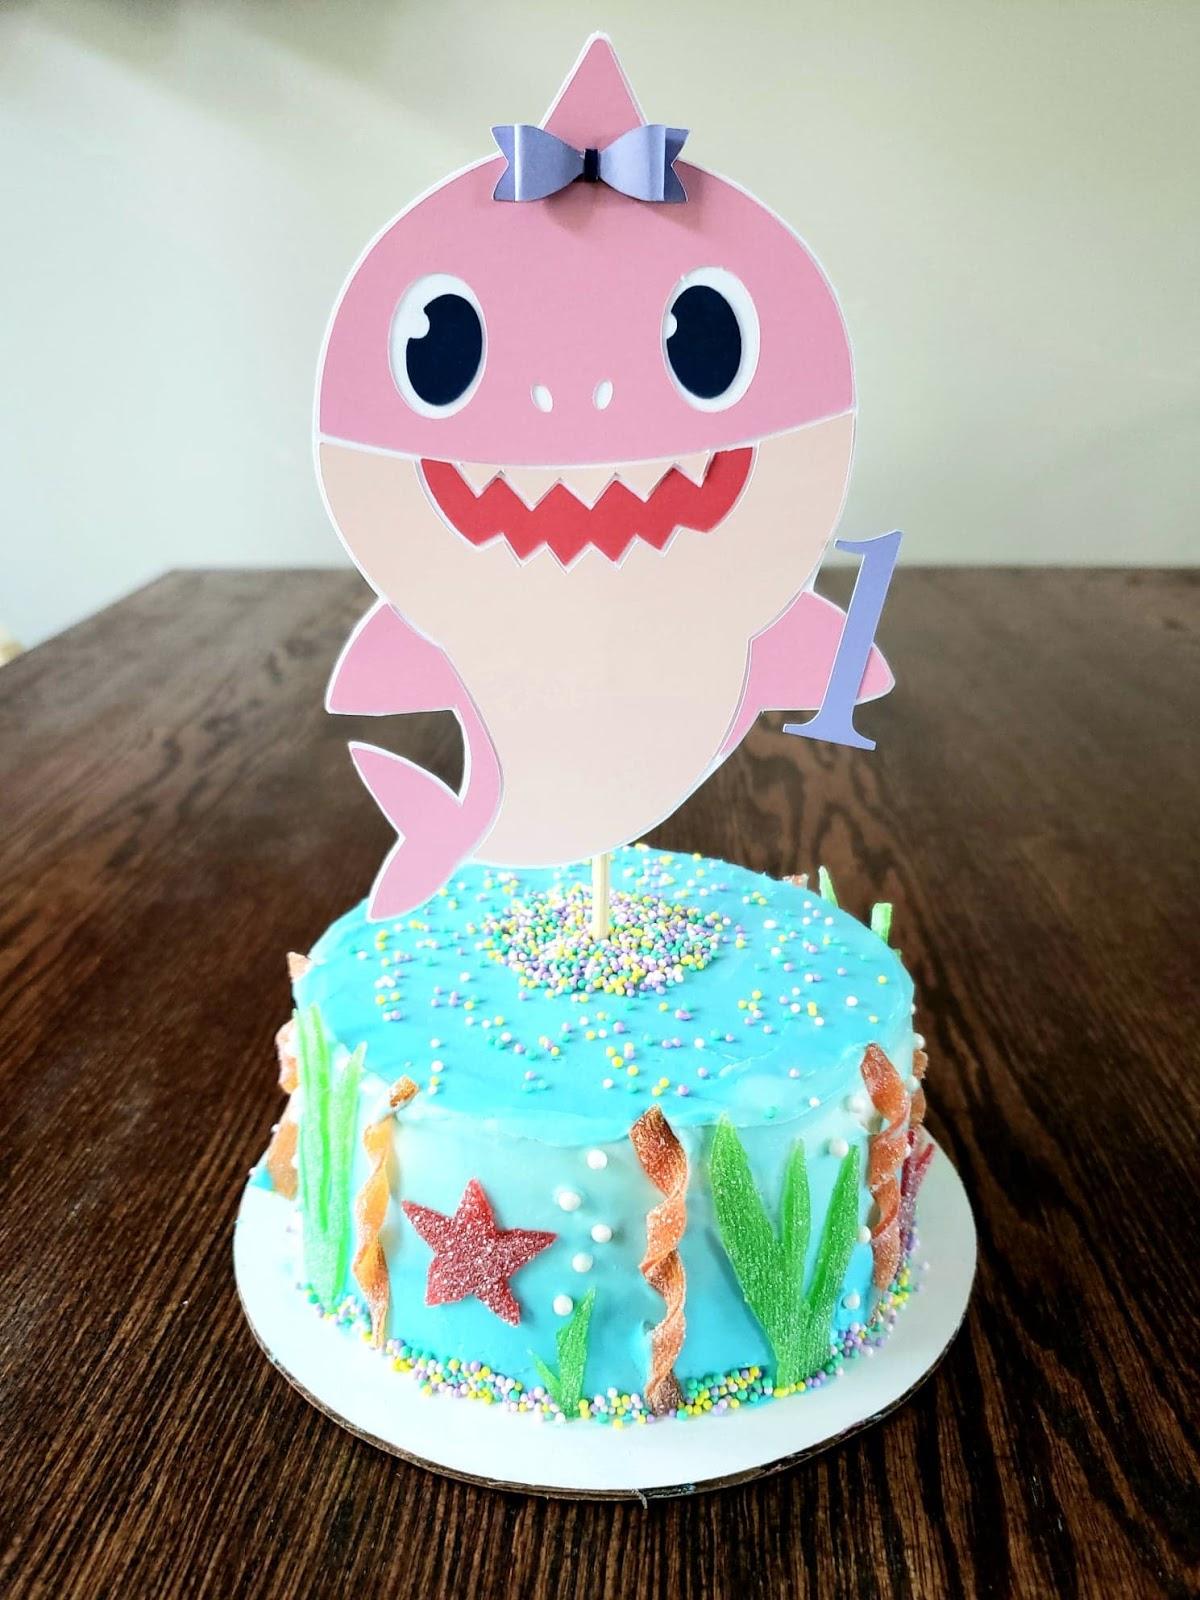 Stupendous Once Daily Diy Baby Shark Ocean Themed Cake Funny Birthday Cards Online Hendilapandamsfinfo